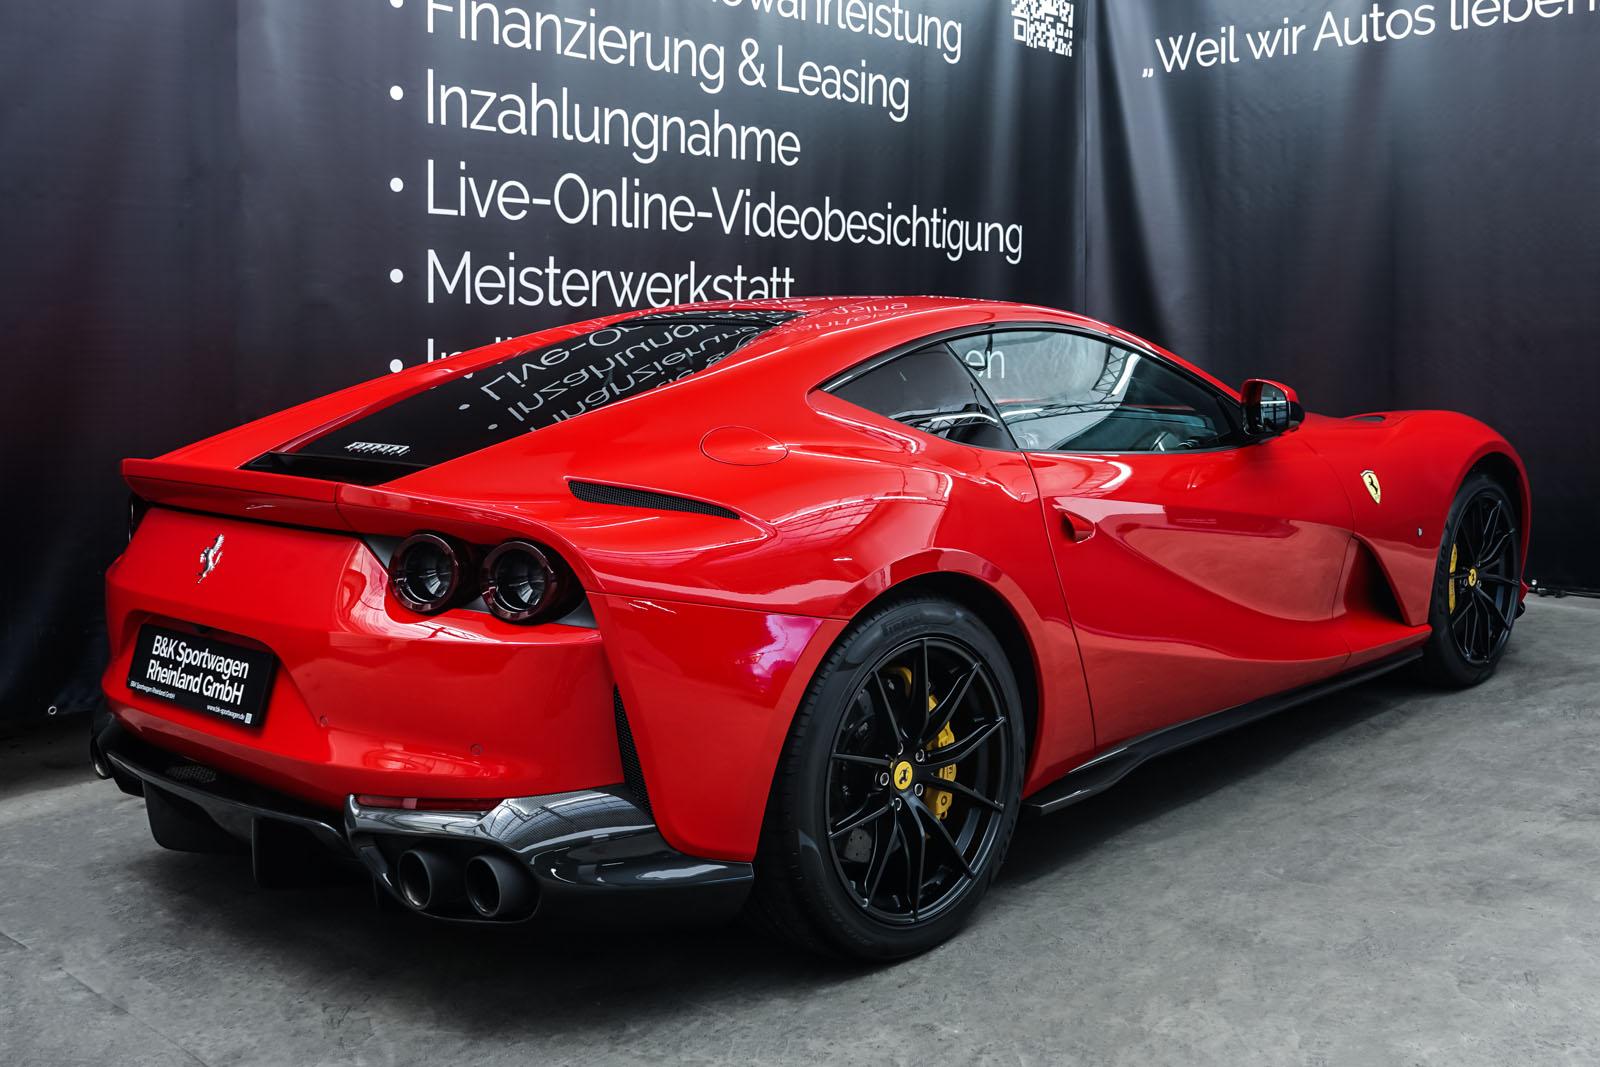 Ferrari_812_Superfast_Rot_Schwarz_FER-9922_15_w